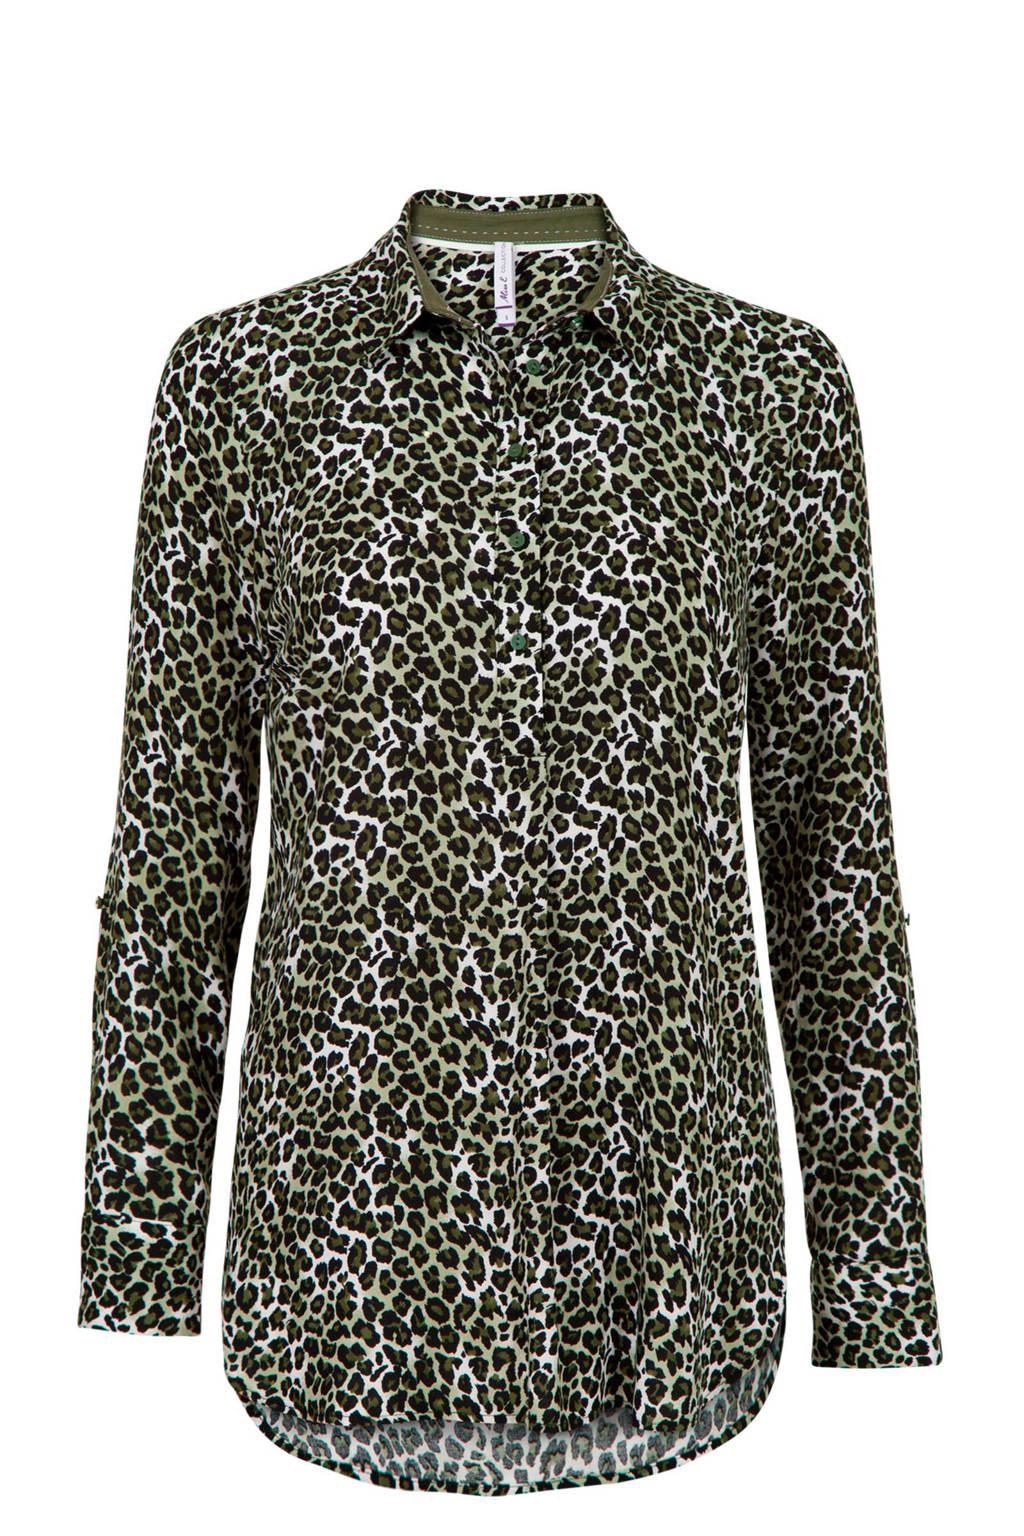 Miss Etam Regulier blouse met dierenprint donkergroen/zwart/wit